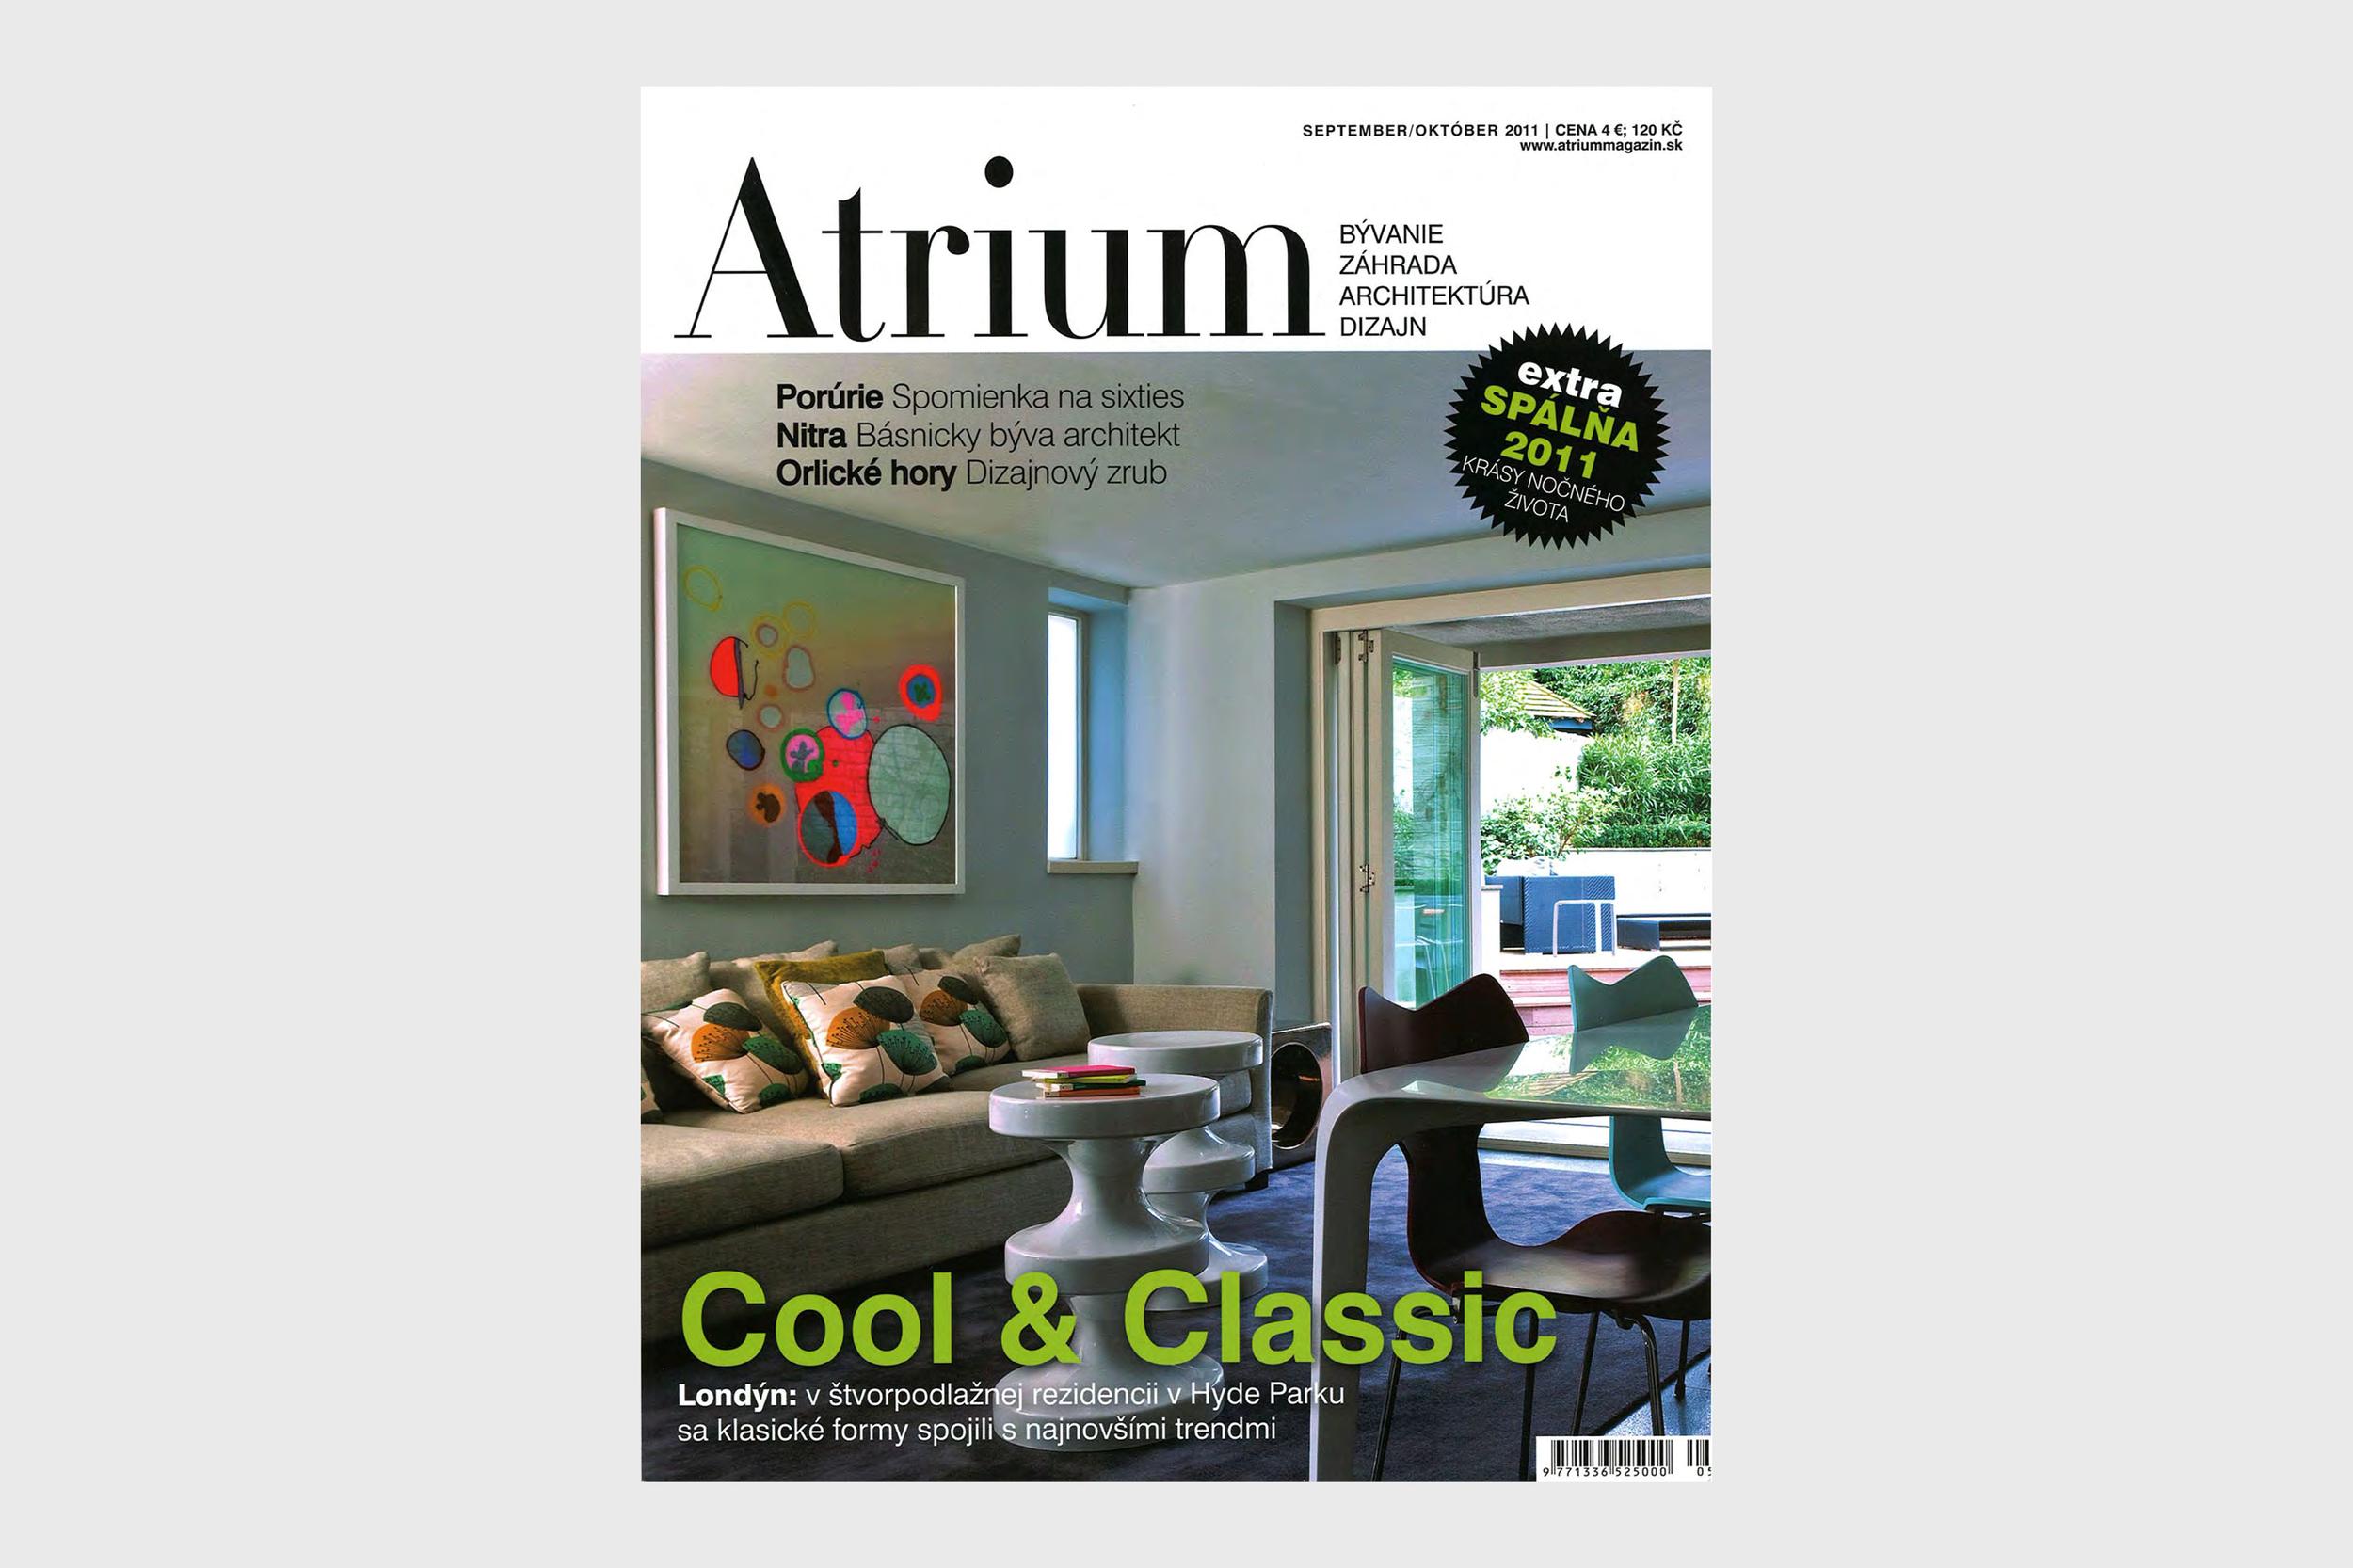 knof-press--atrium--2011-09_01.jpg